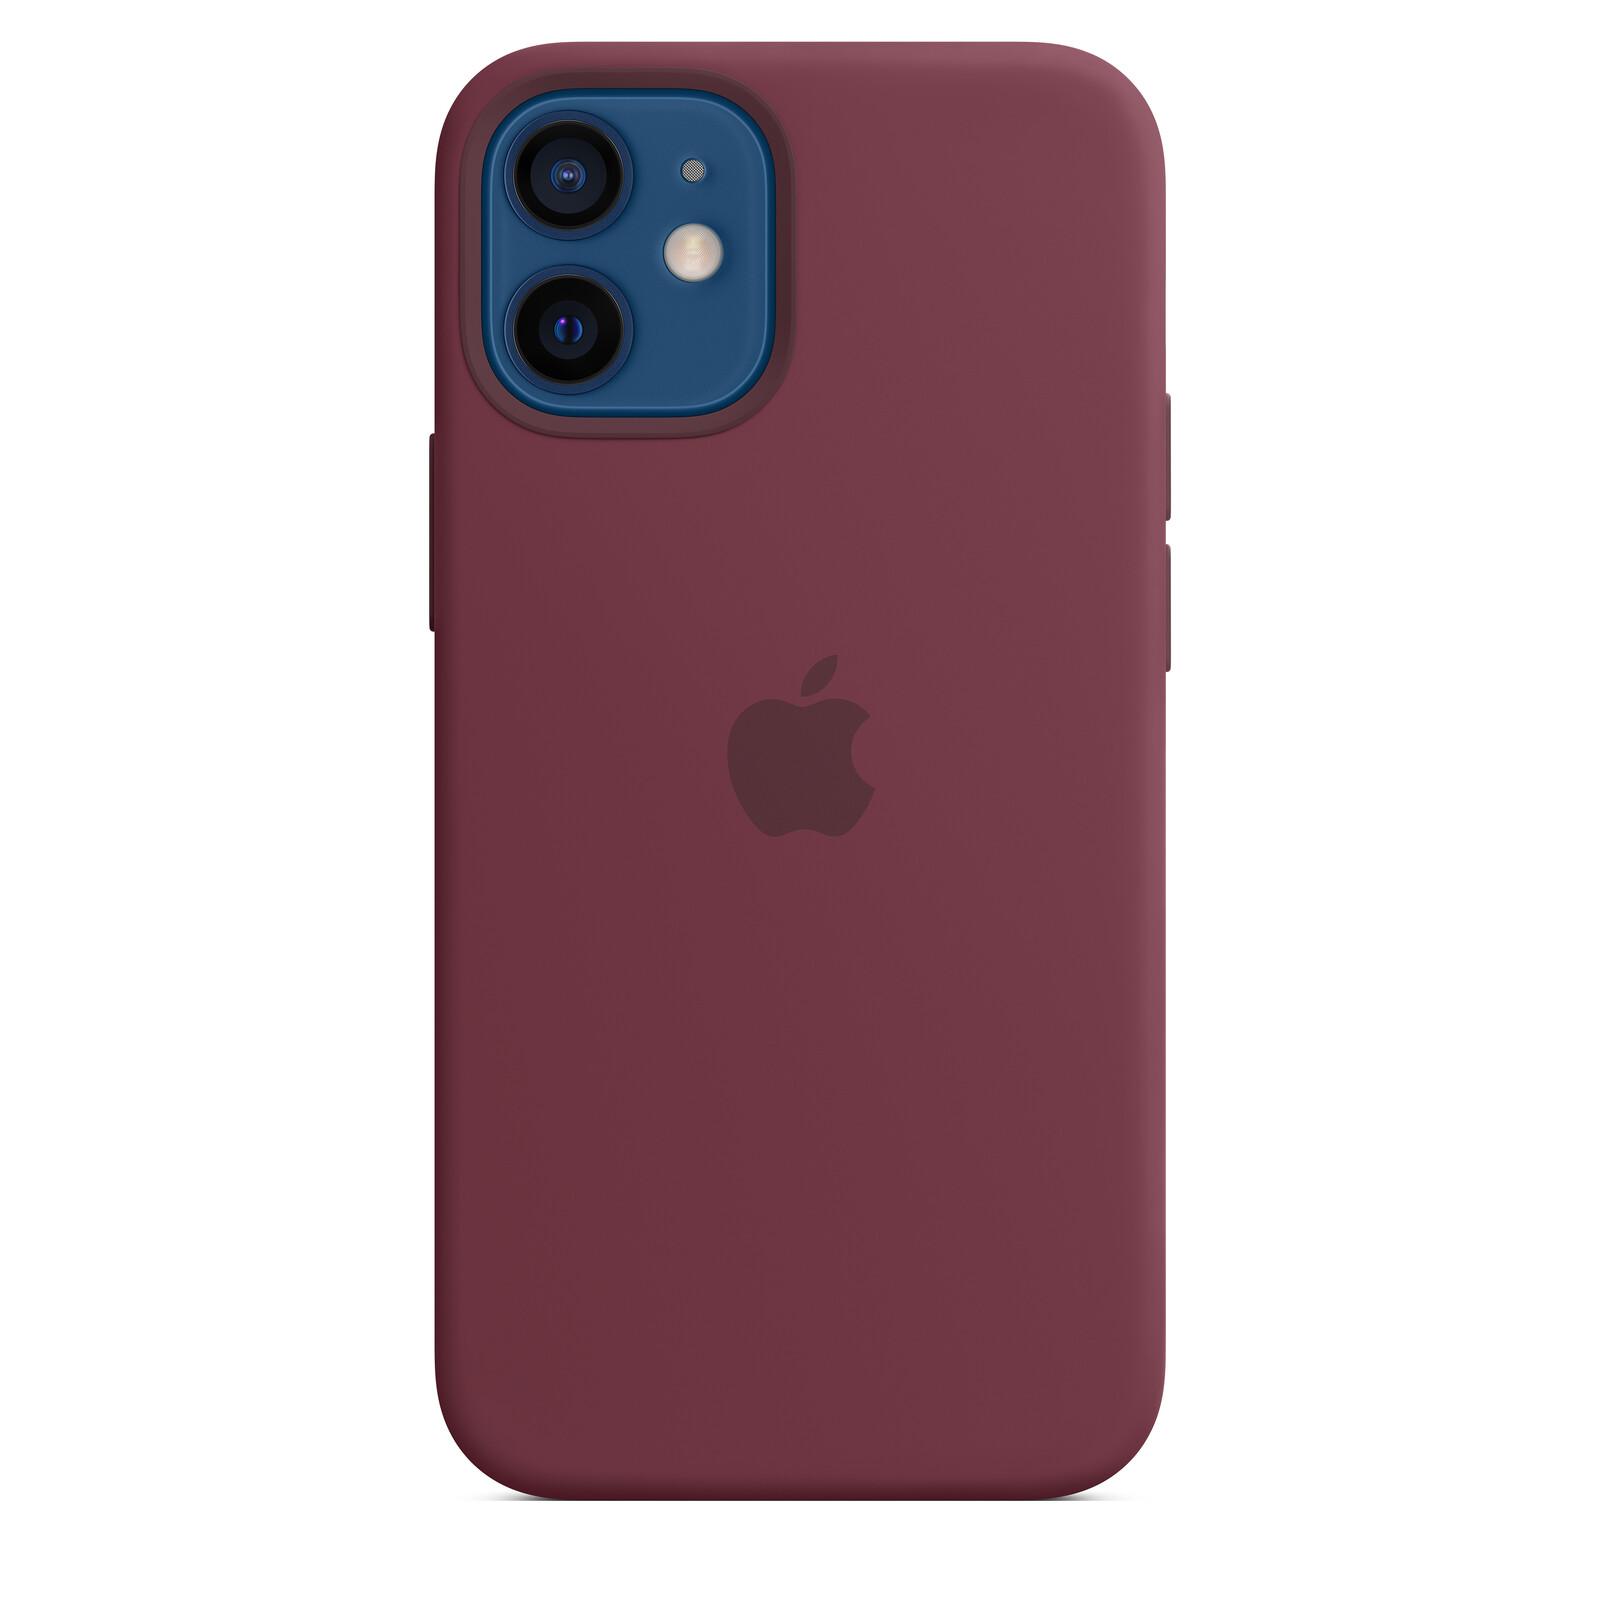 Apple iPhone 12 mini Silikon Case mit MagSafe pflaume